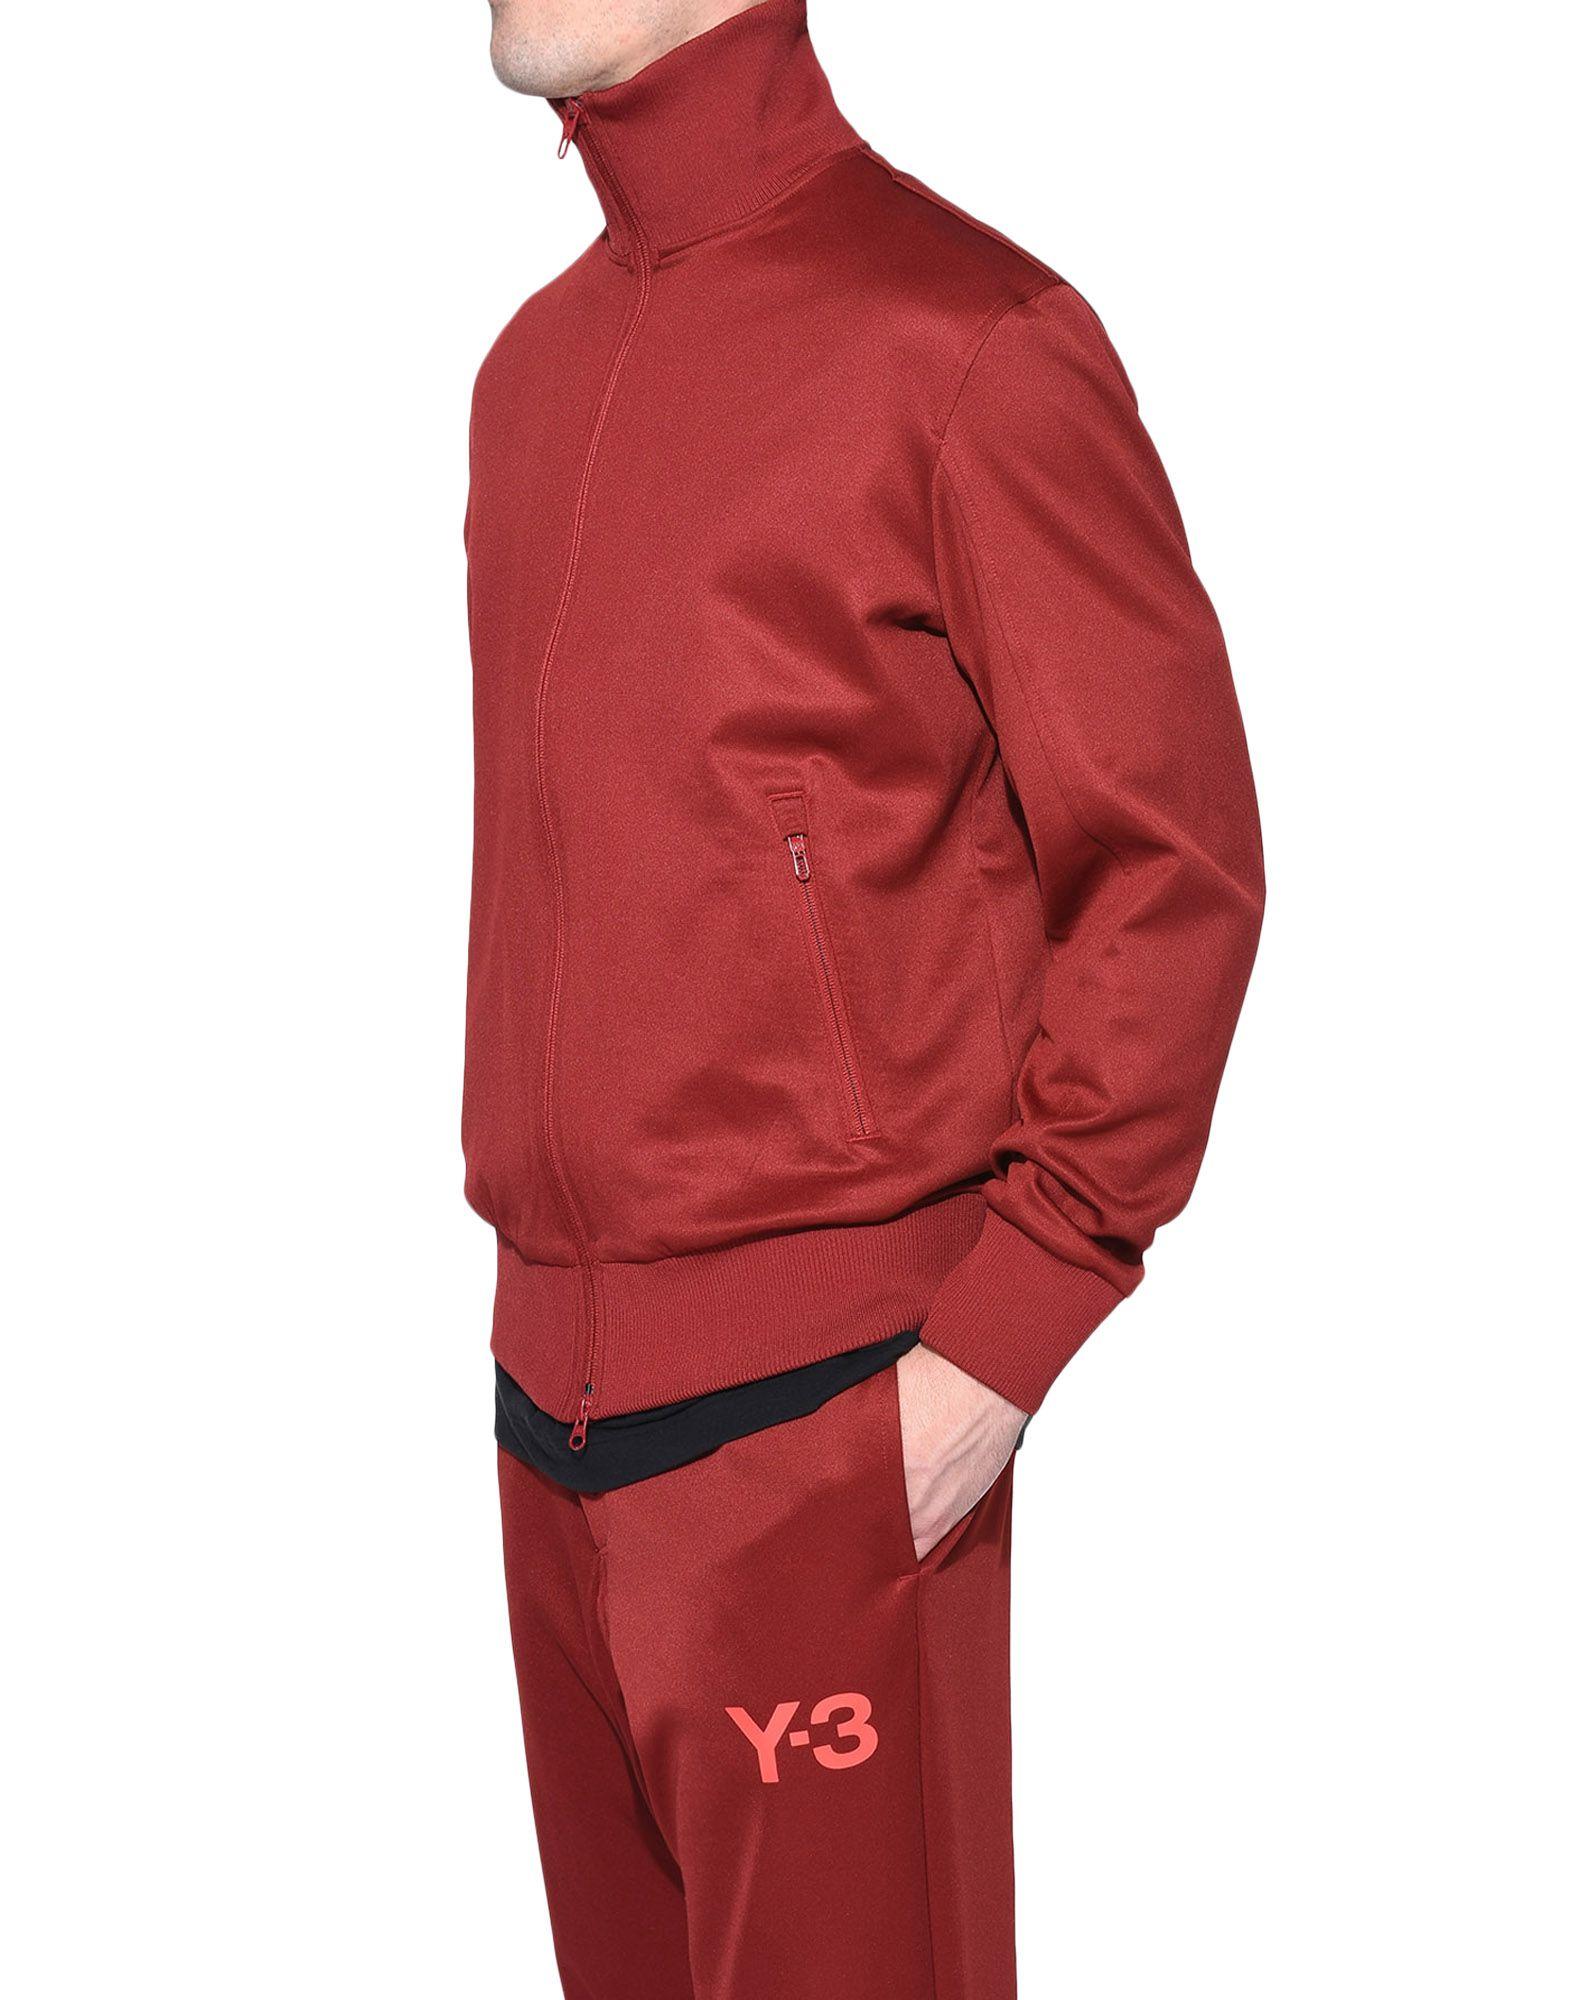 Y-3 Y-3 Classic Track Jacket Track top メンズ e